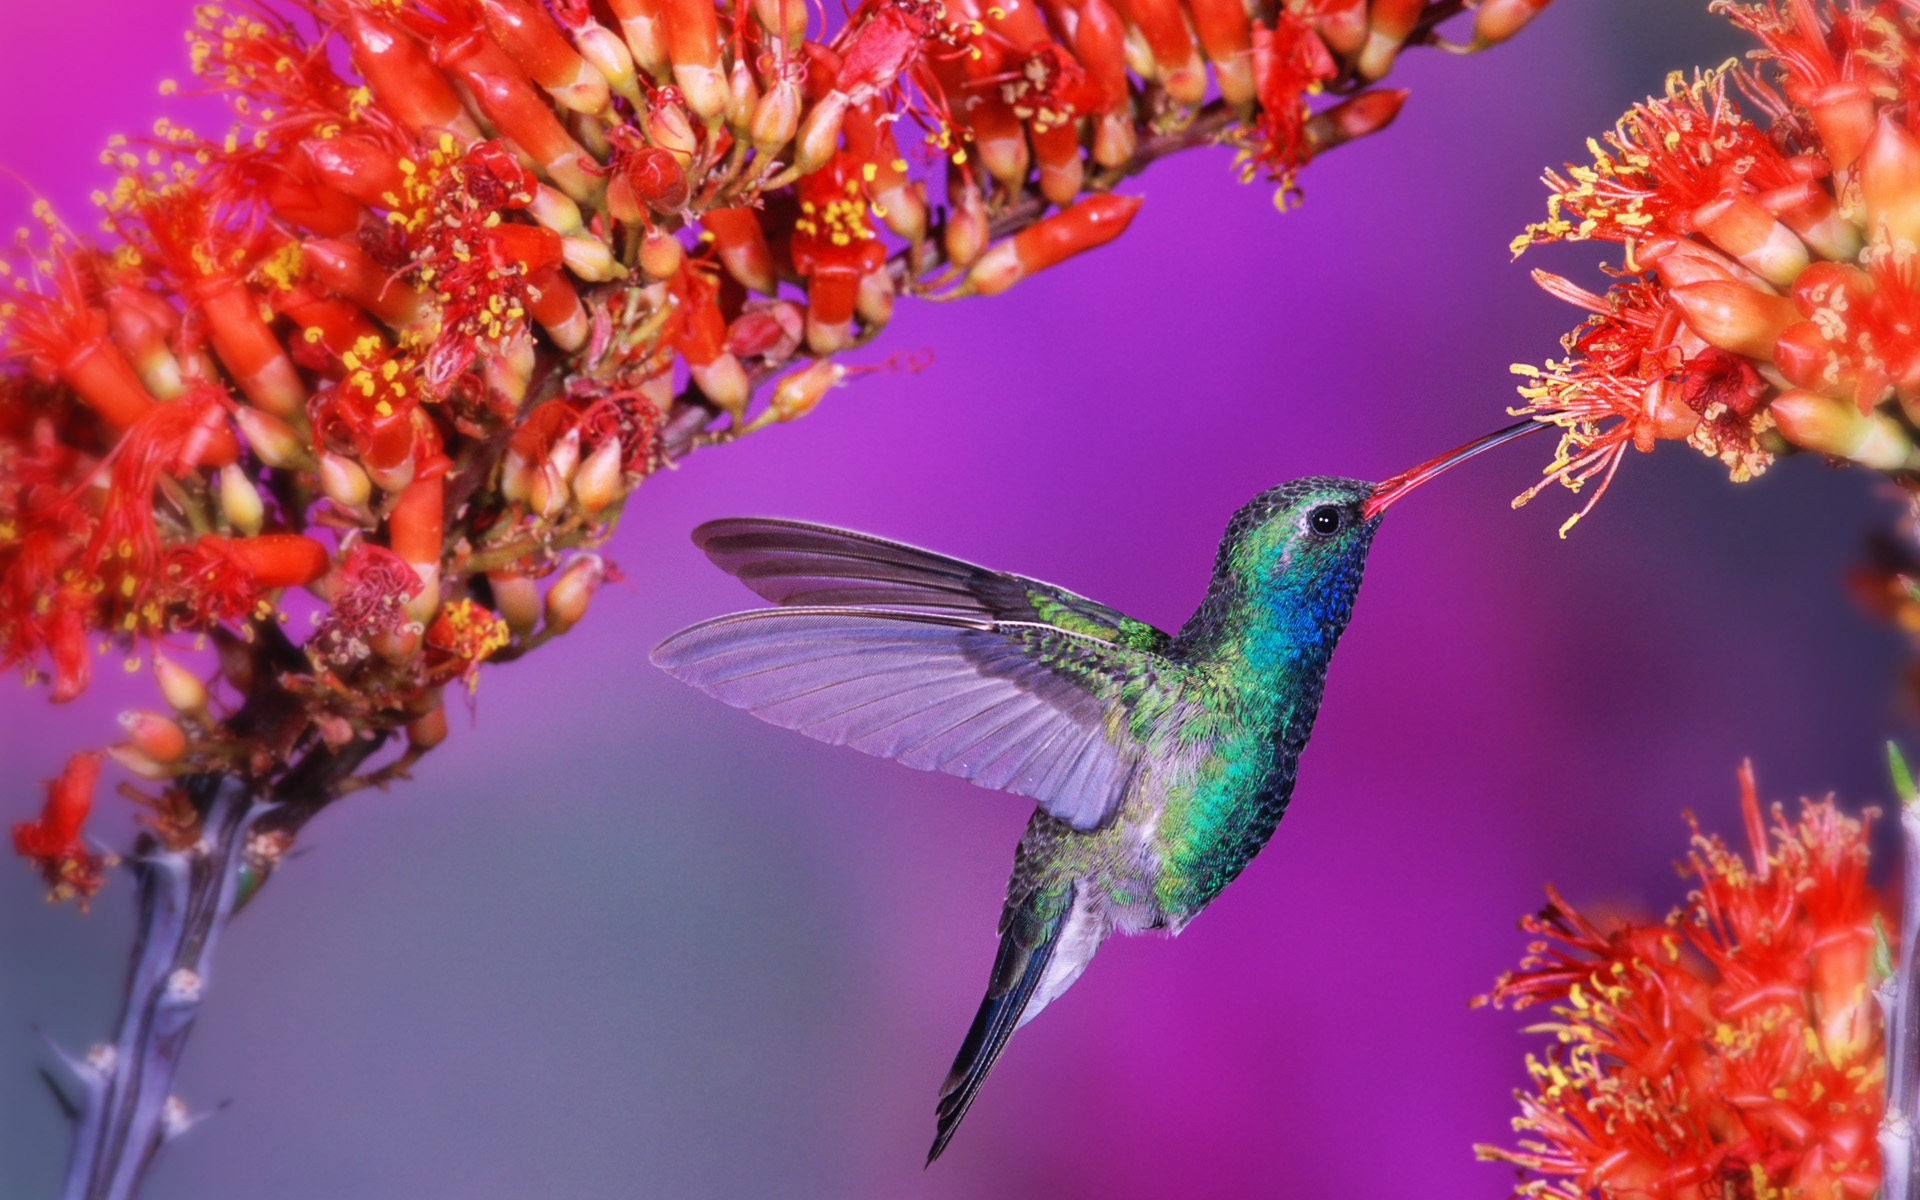 Hummingbird Wallpapers Wallpapers Hd